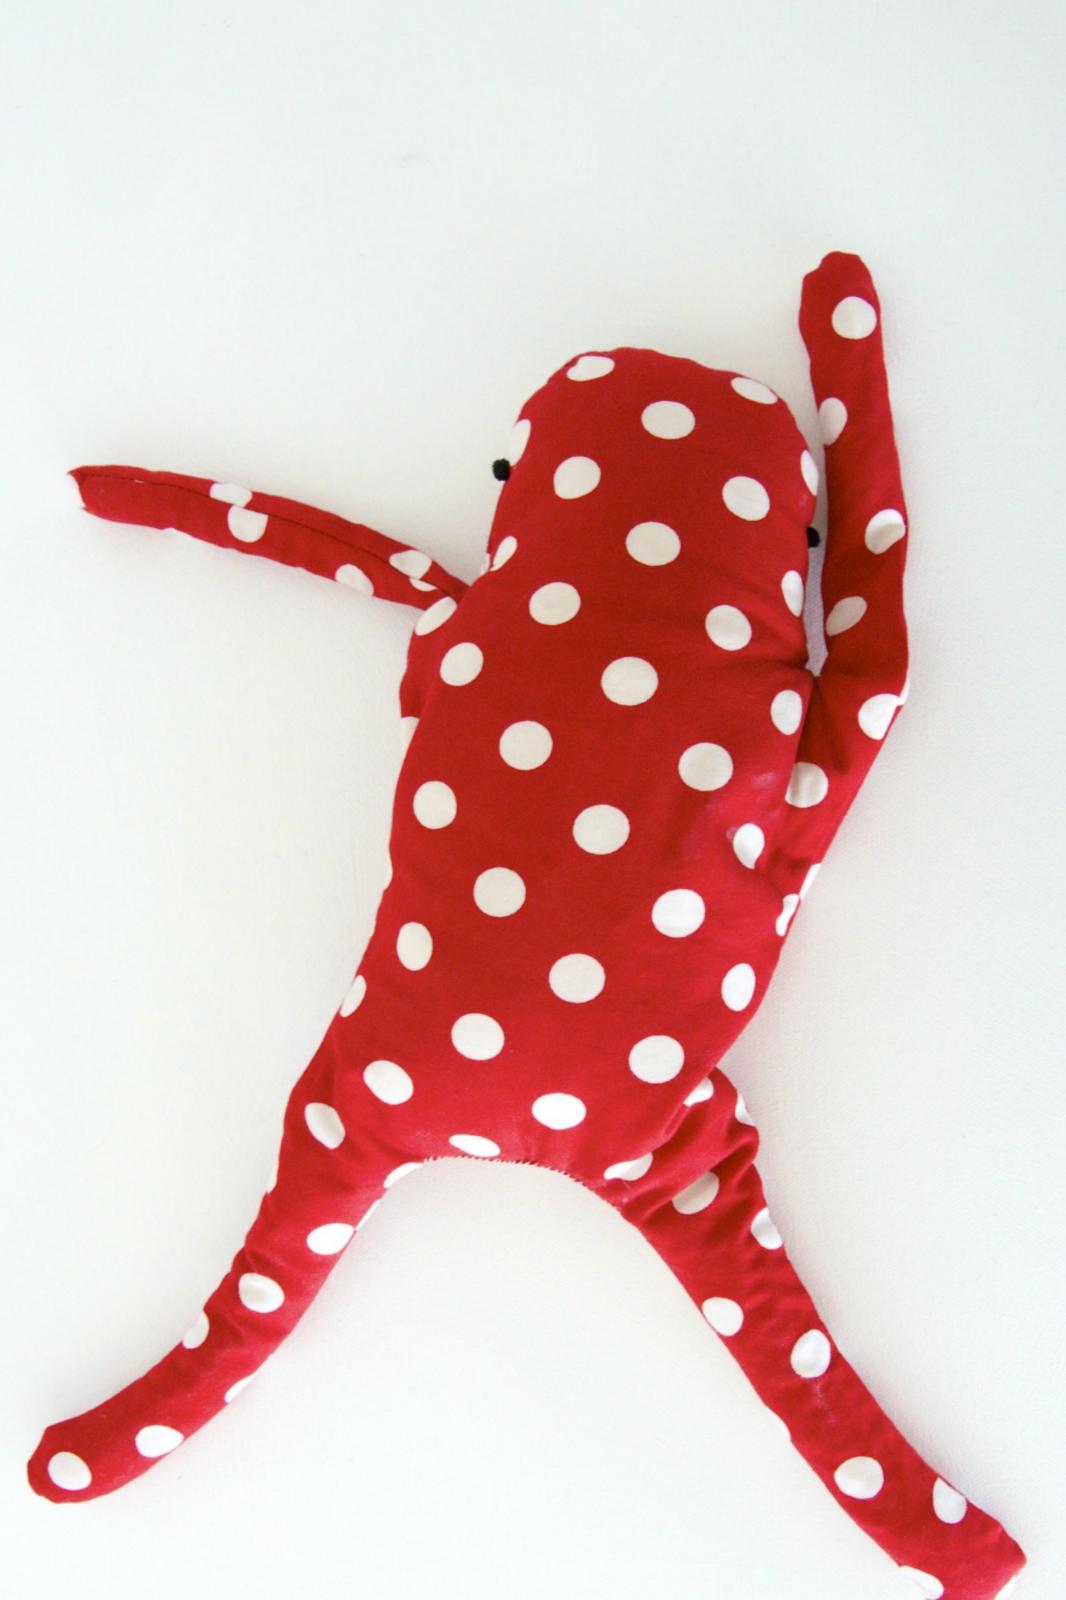 Wheat bag red and white polka dot with green heart felt for Polka dot felt fabric